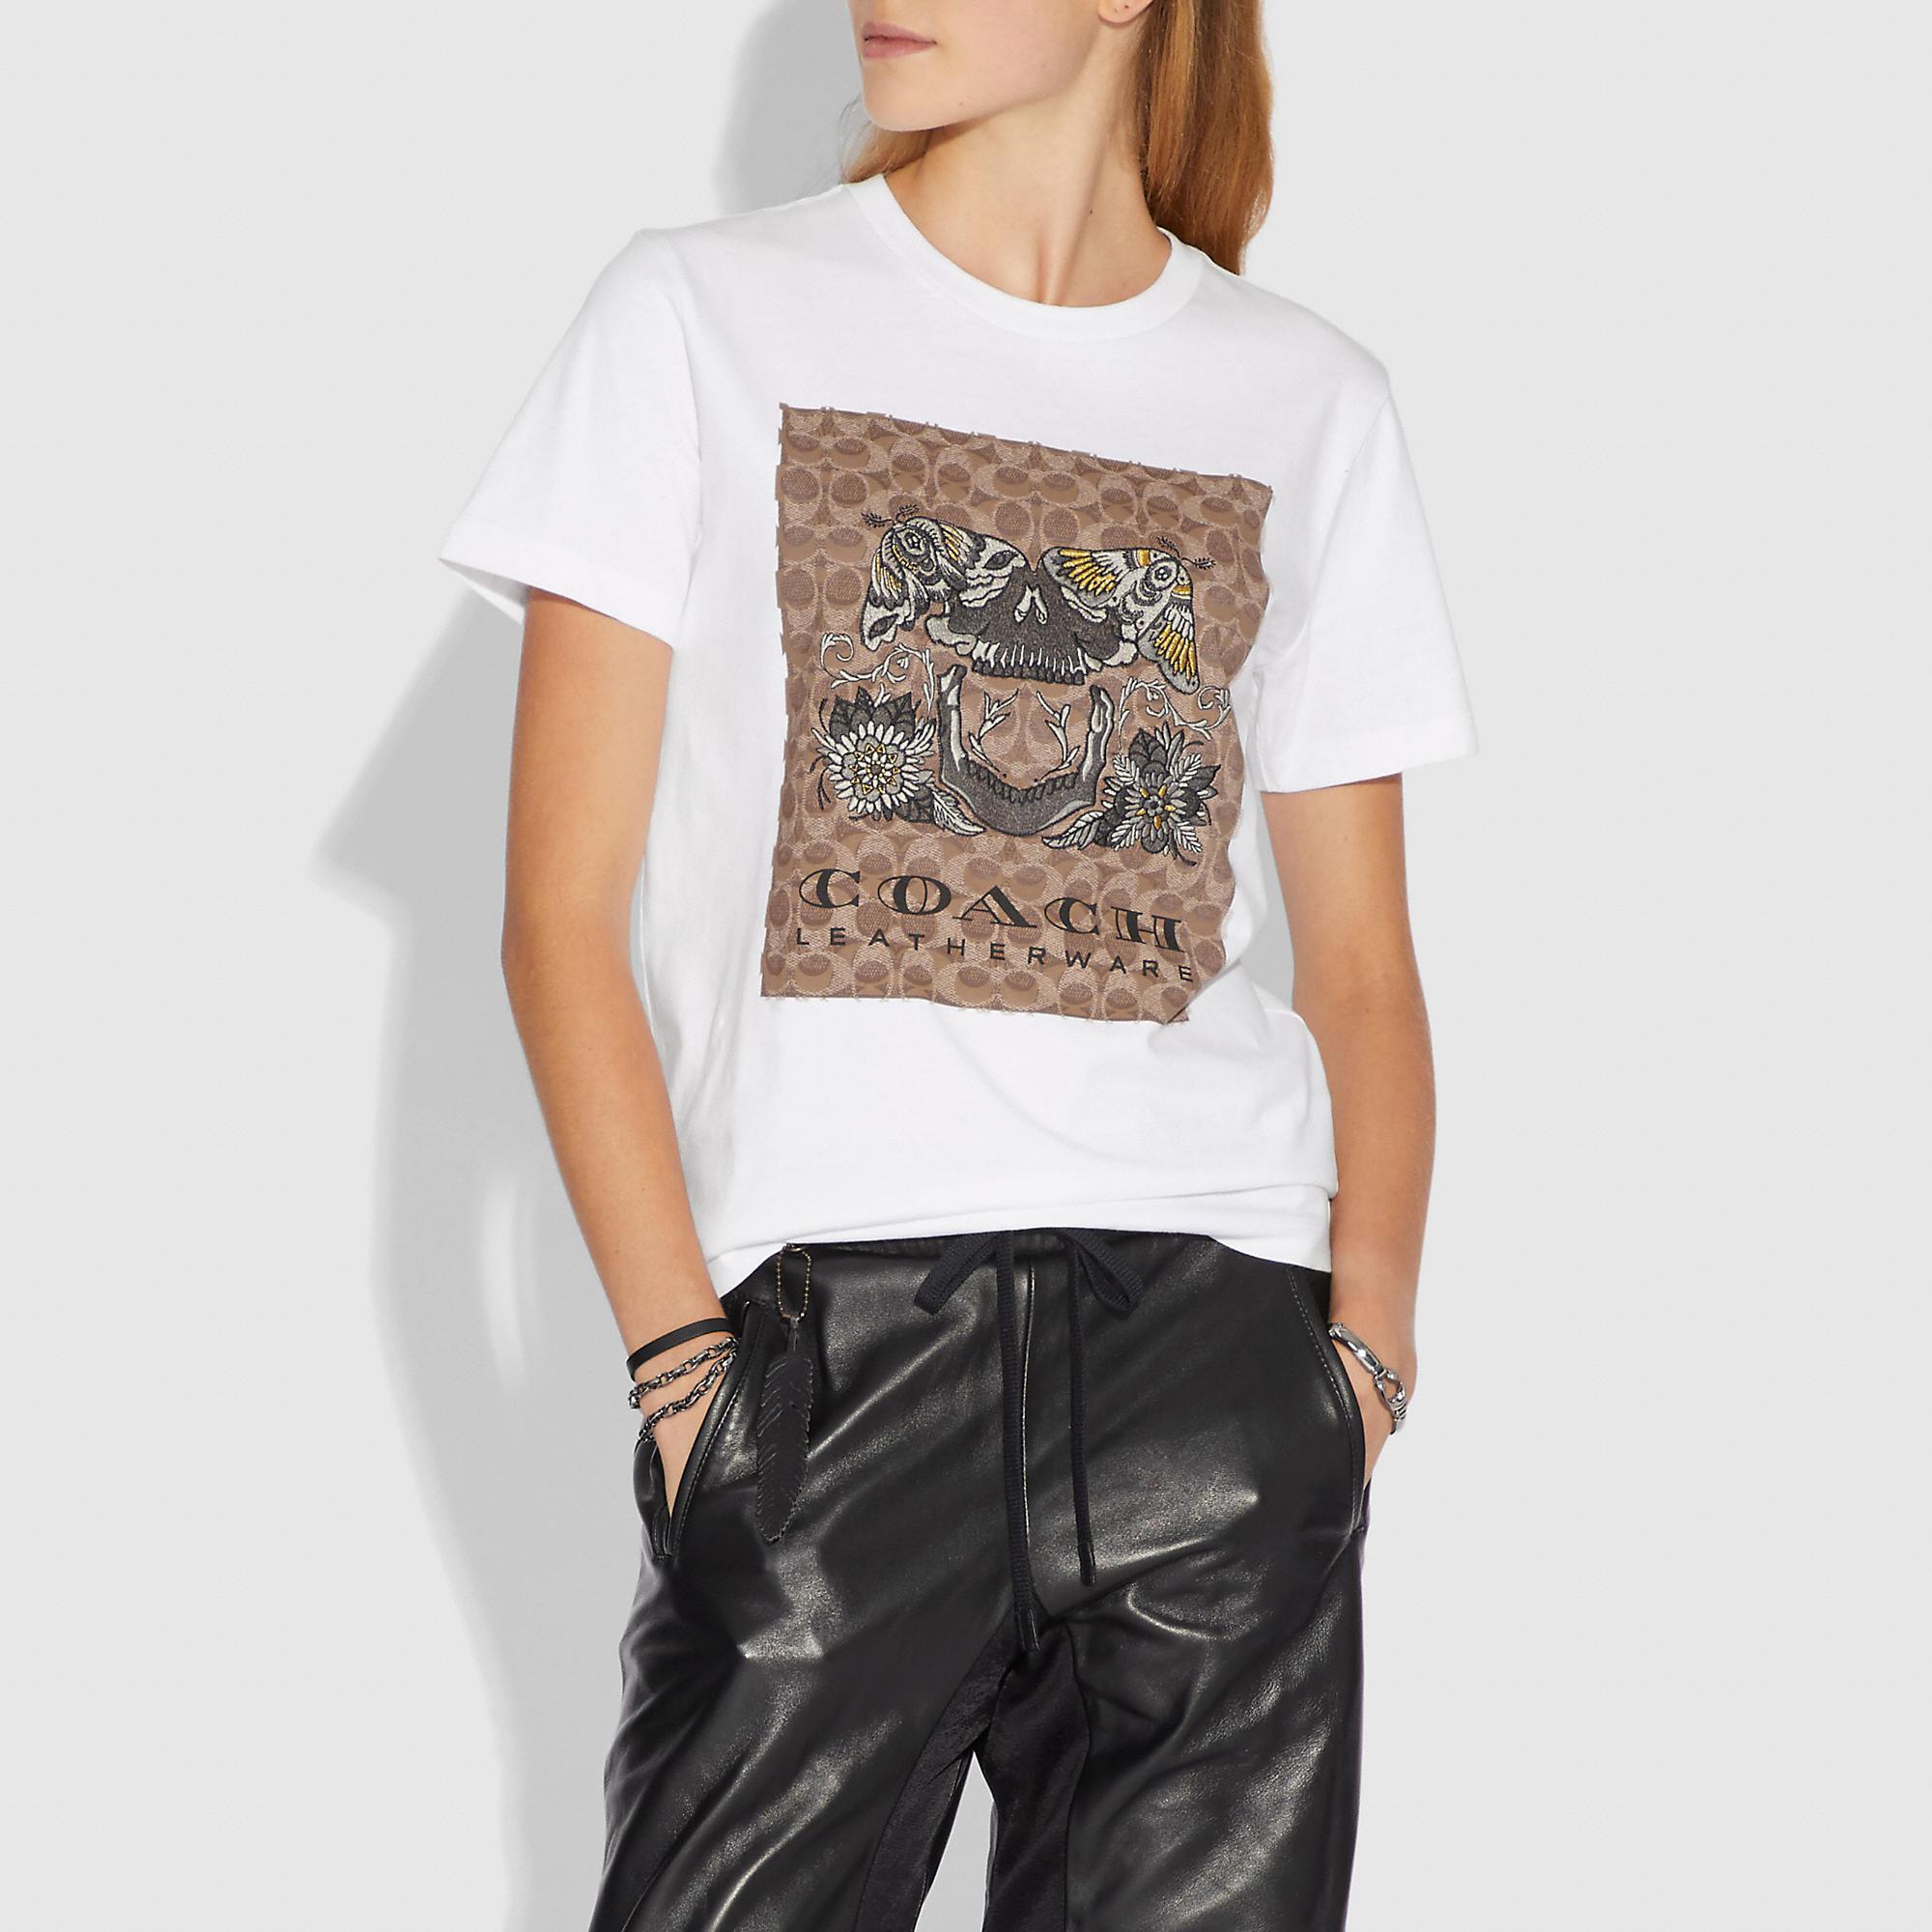 4949b1787eeb7 Lyst - COACH Signature Tattoo T-shirt in White - Save 50%